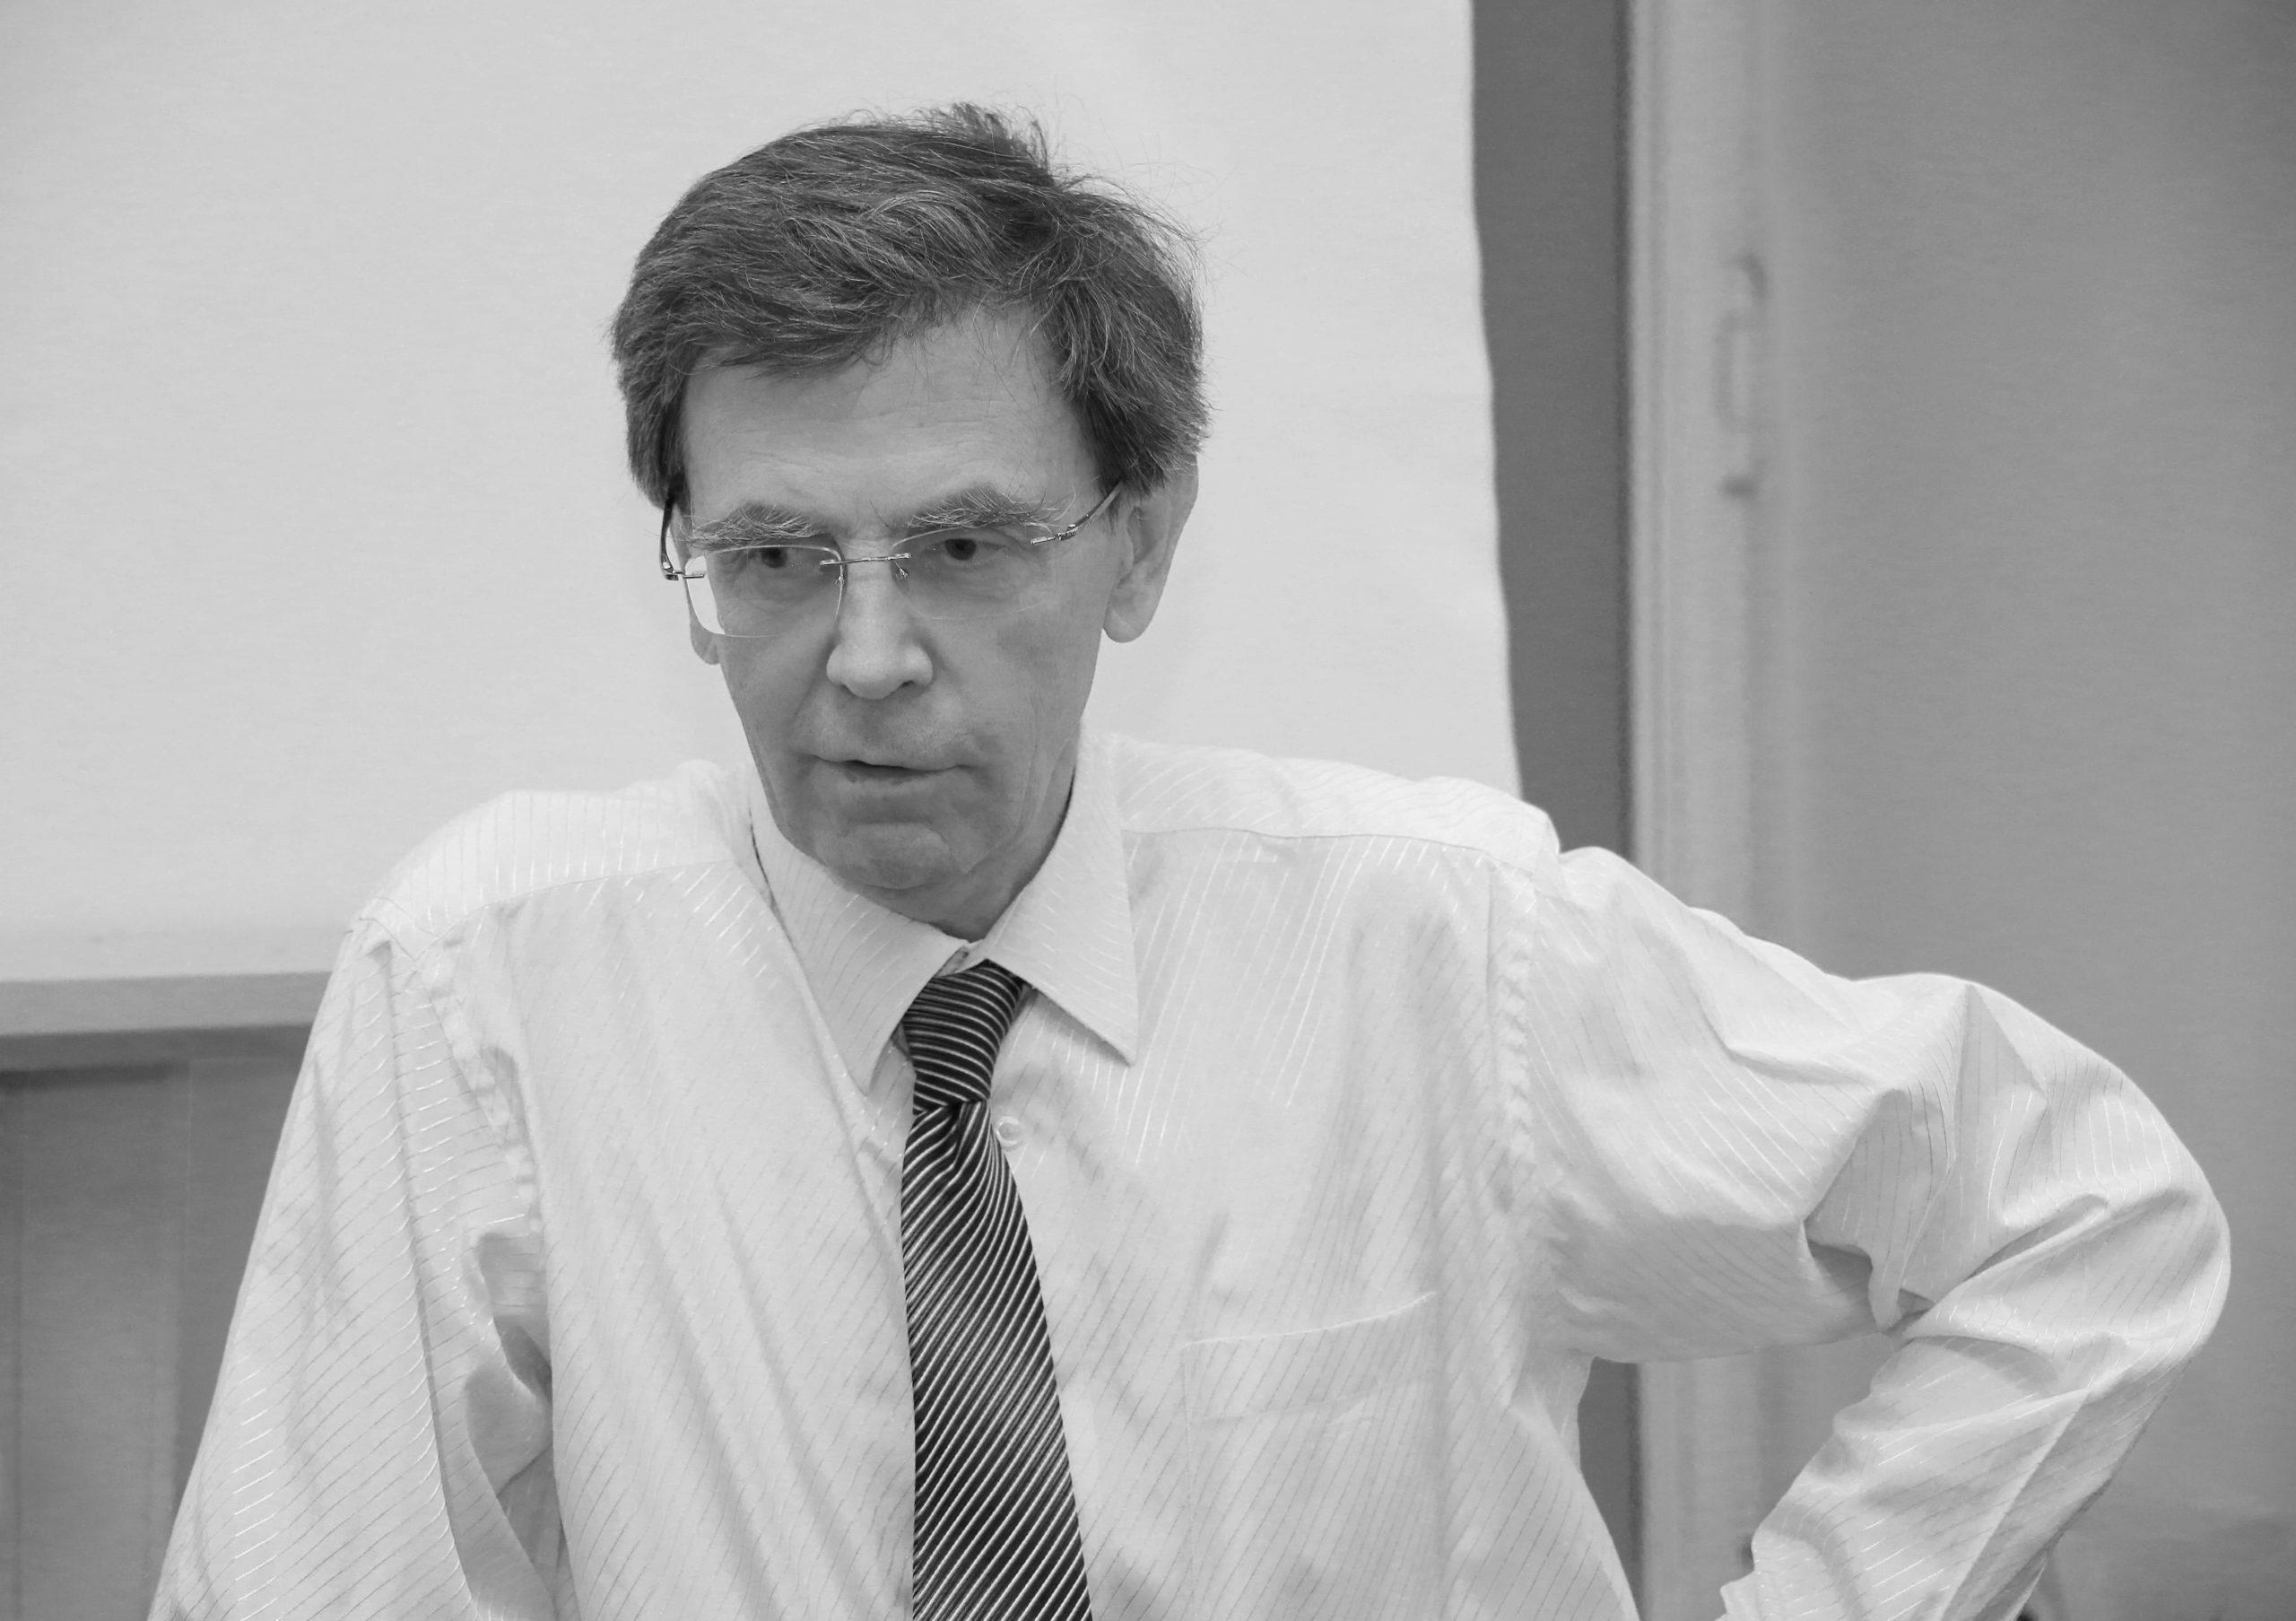 Юбилей академика А.Т.Фоменко